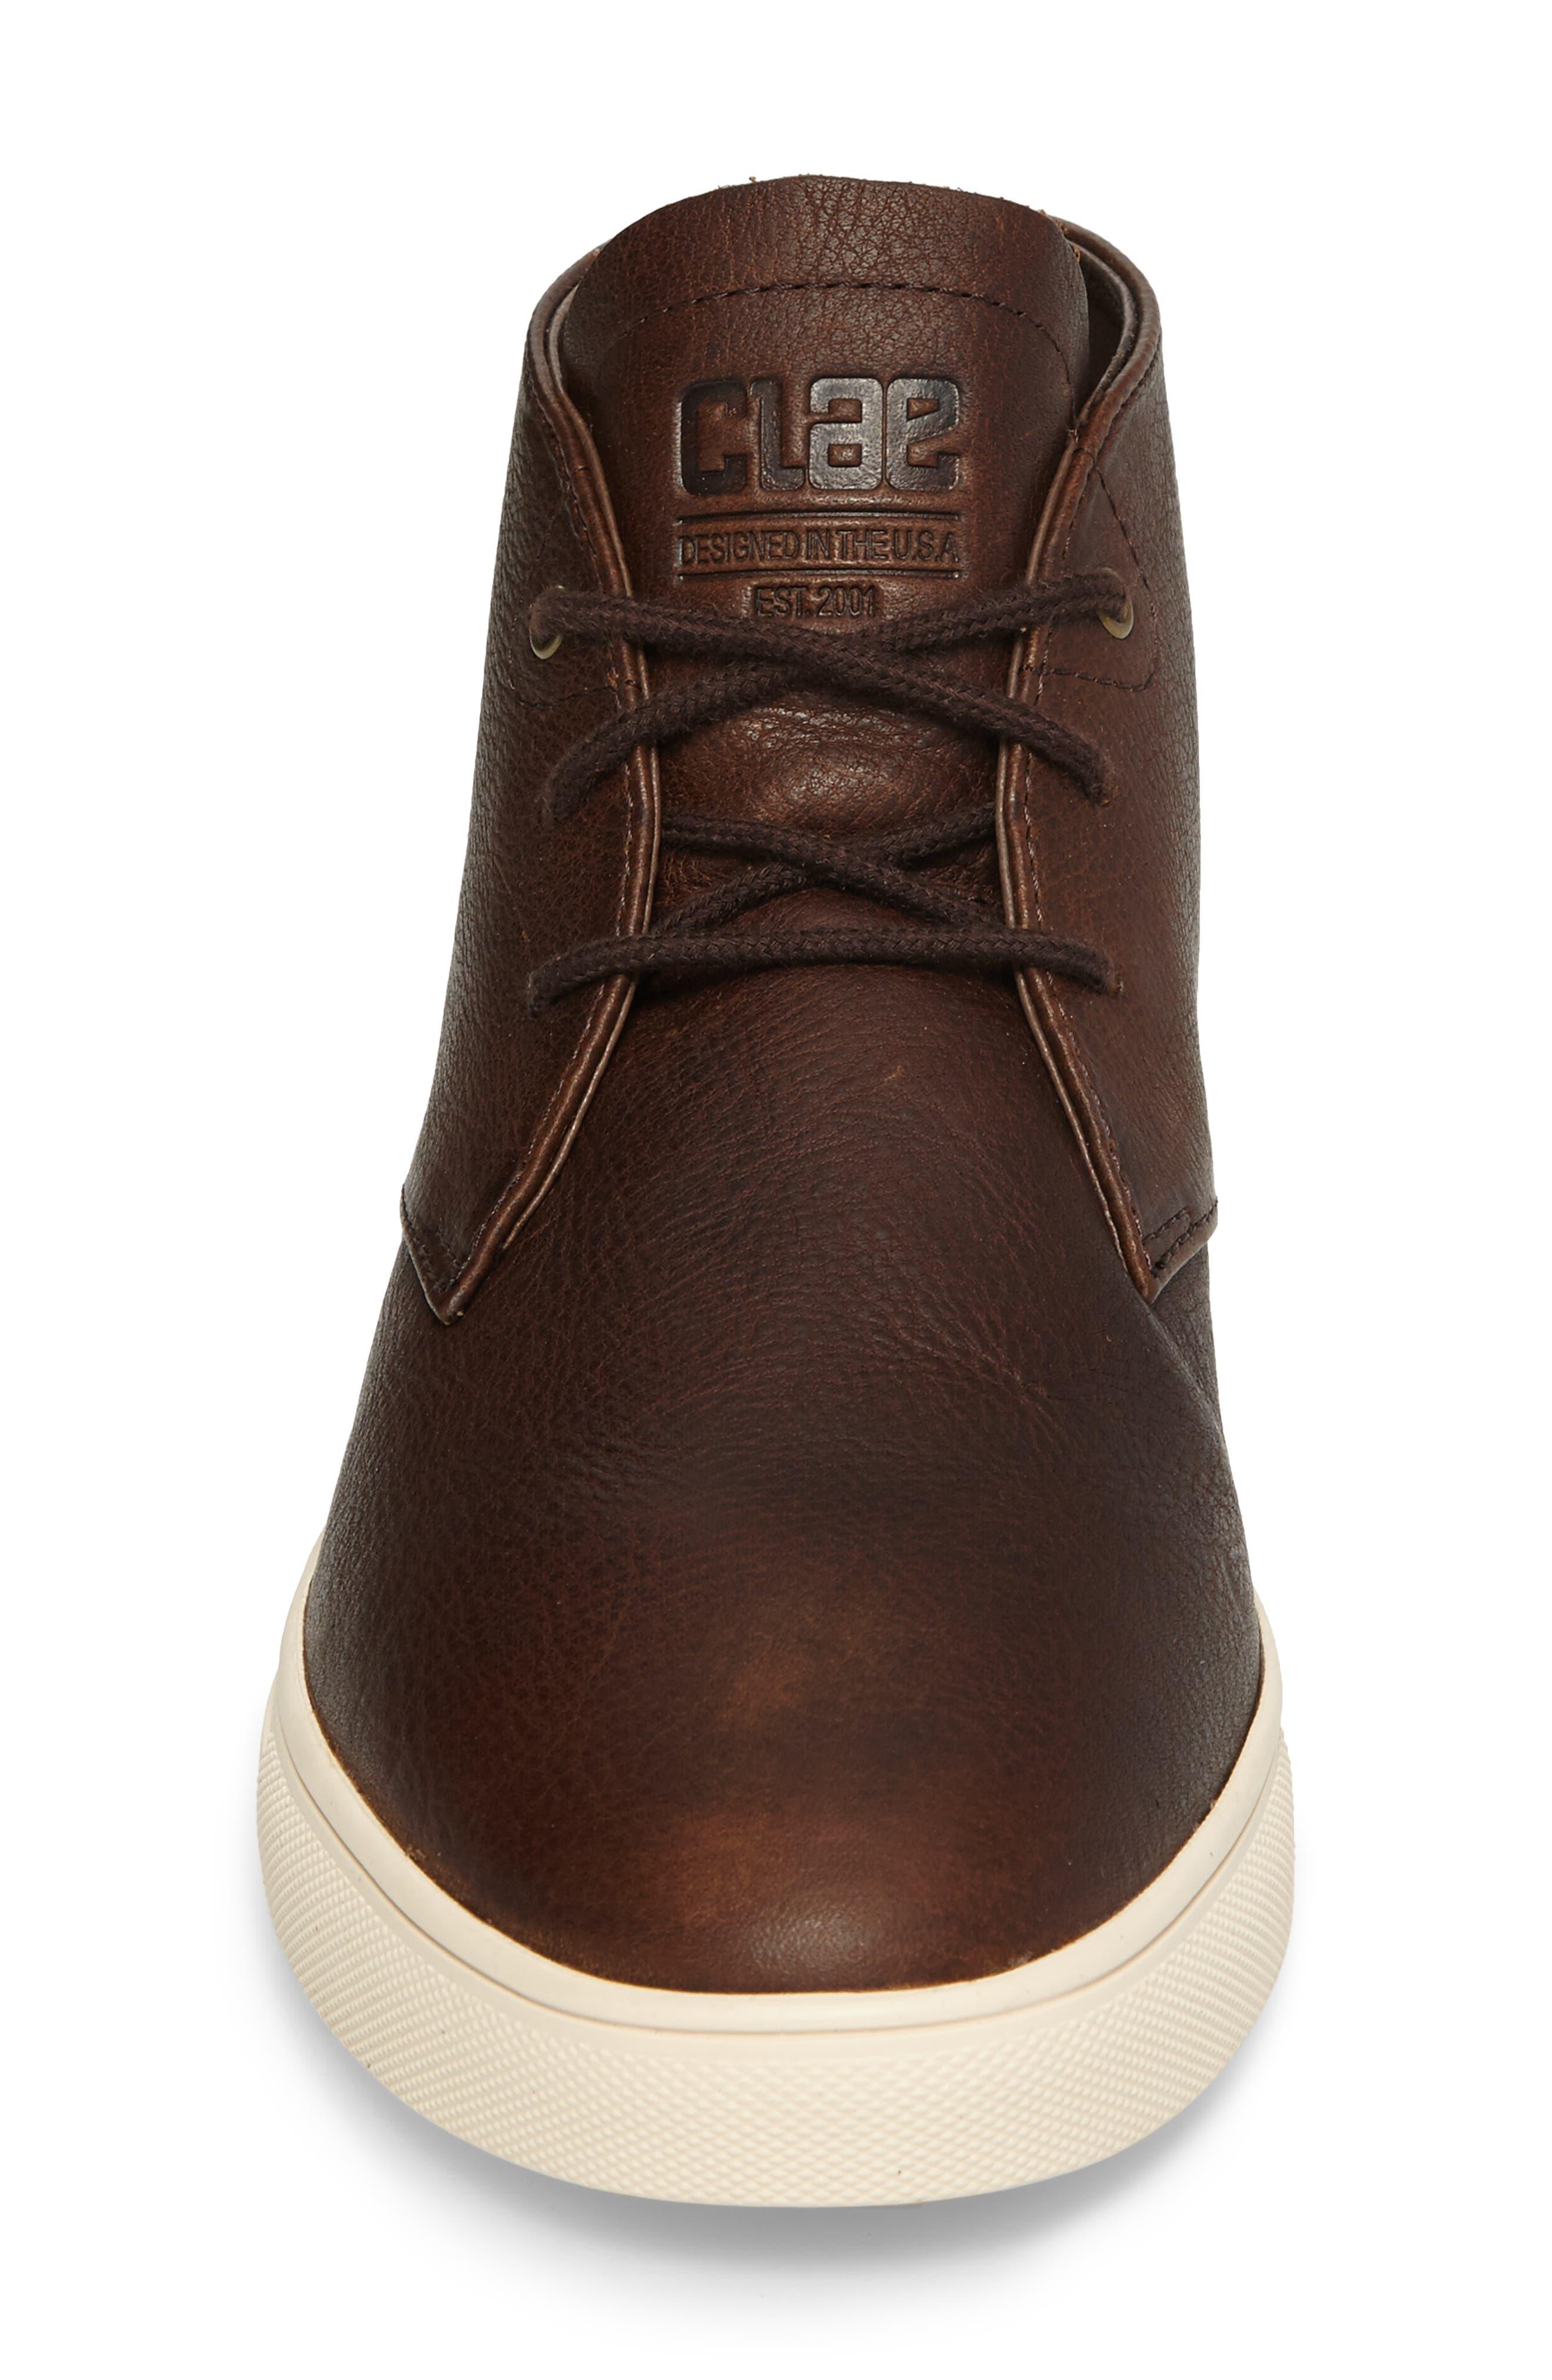 'Strayhorn SP' Chukka Boot,                             Alternate thumbnail 4, color,                             Cocoa Leather